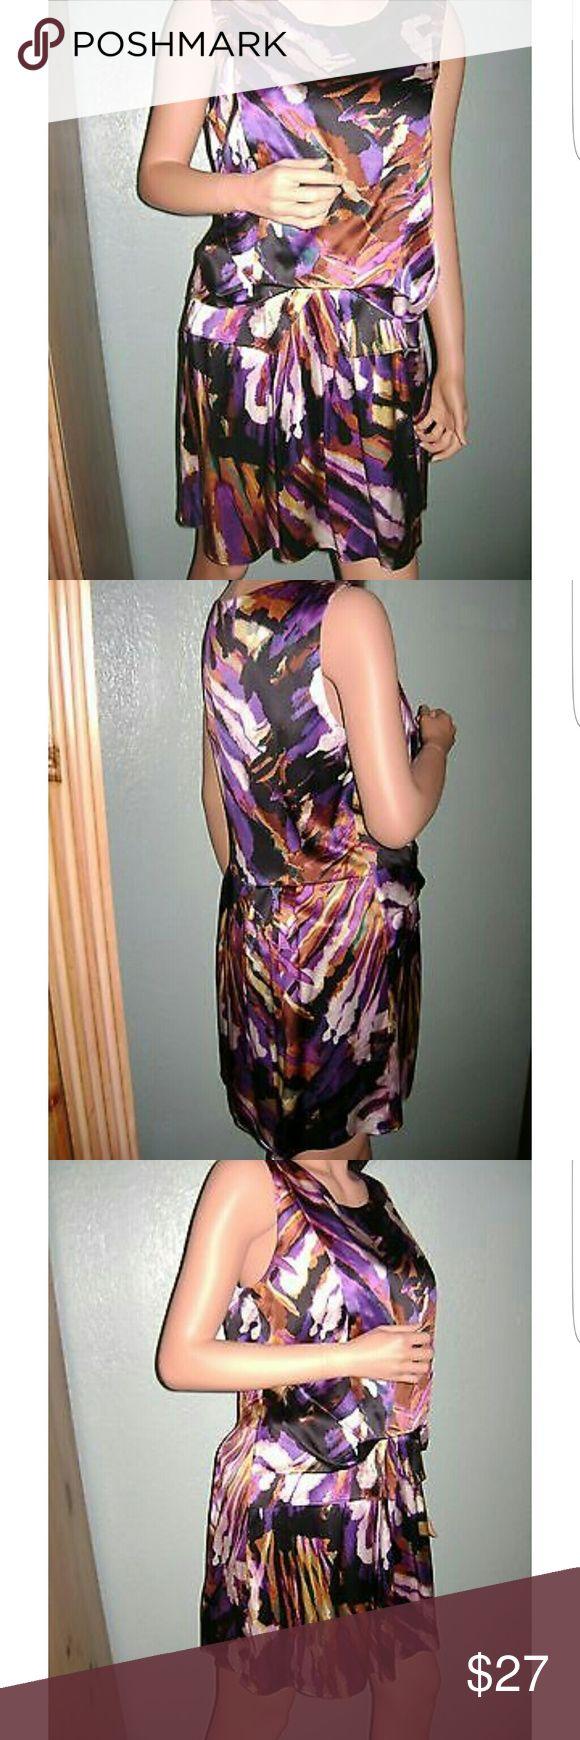 ALI RO abstract watercolor print silk dress Like new great condition silk watercolor dress Ali Ro Dresses